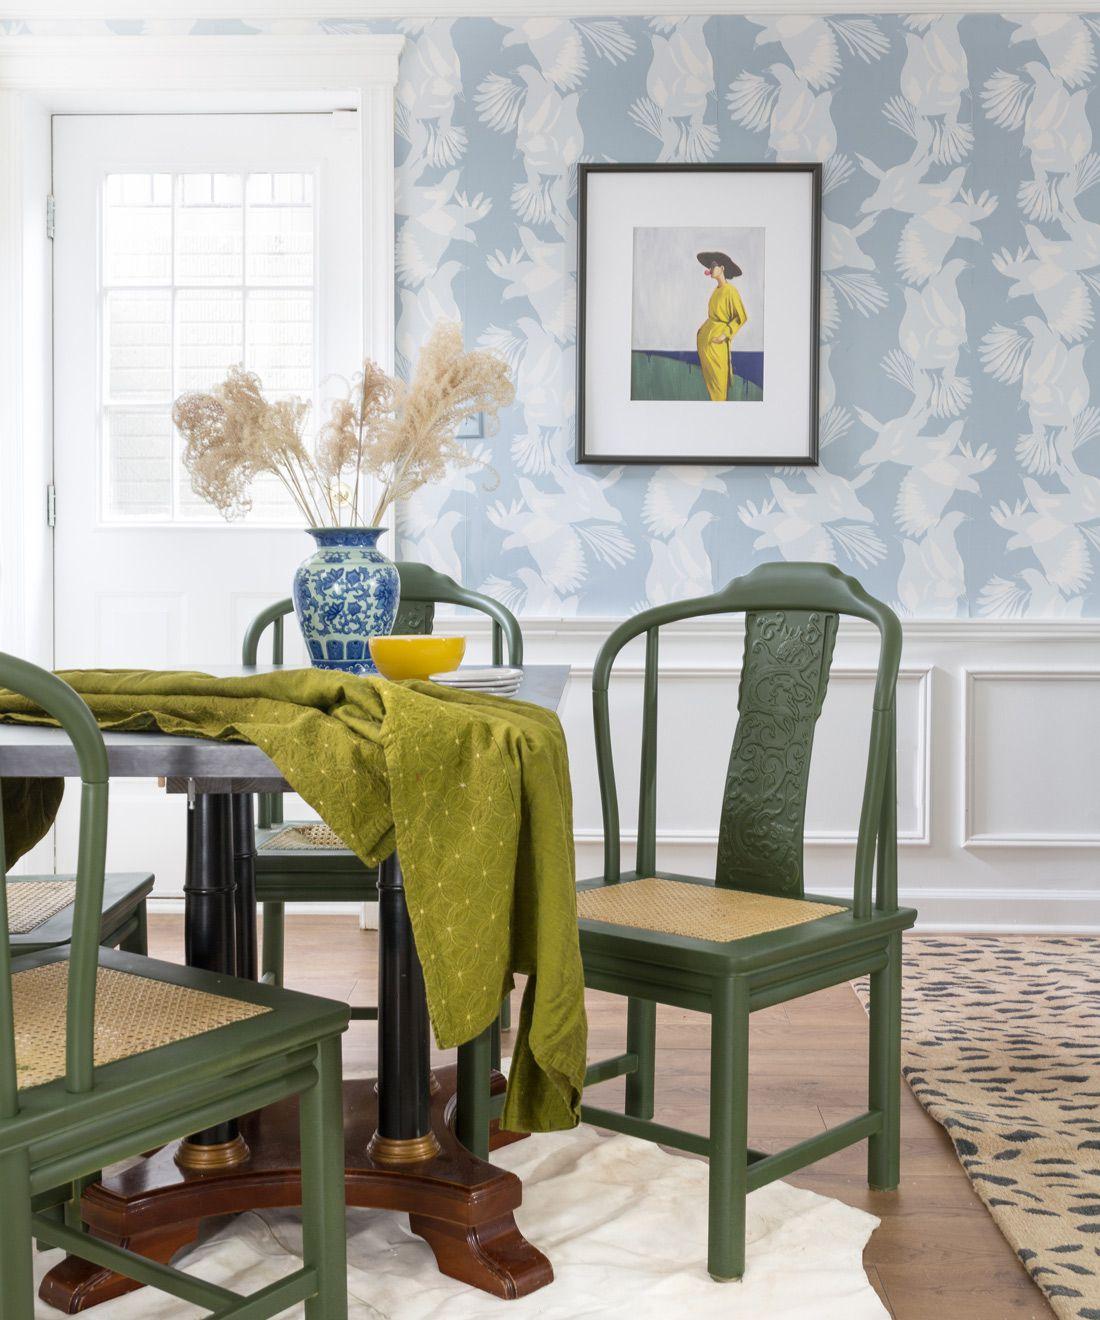 Magpie Wallpaper • Australia Collection by Kingdom Home • Blue Wallpaper • Bird Wallpaper • Photo by Jewel Marlowe • Milton & King EU